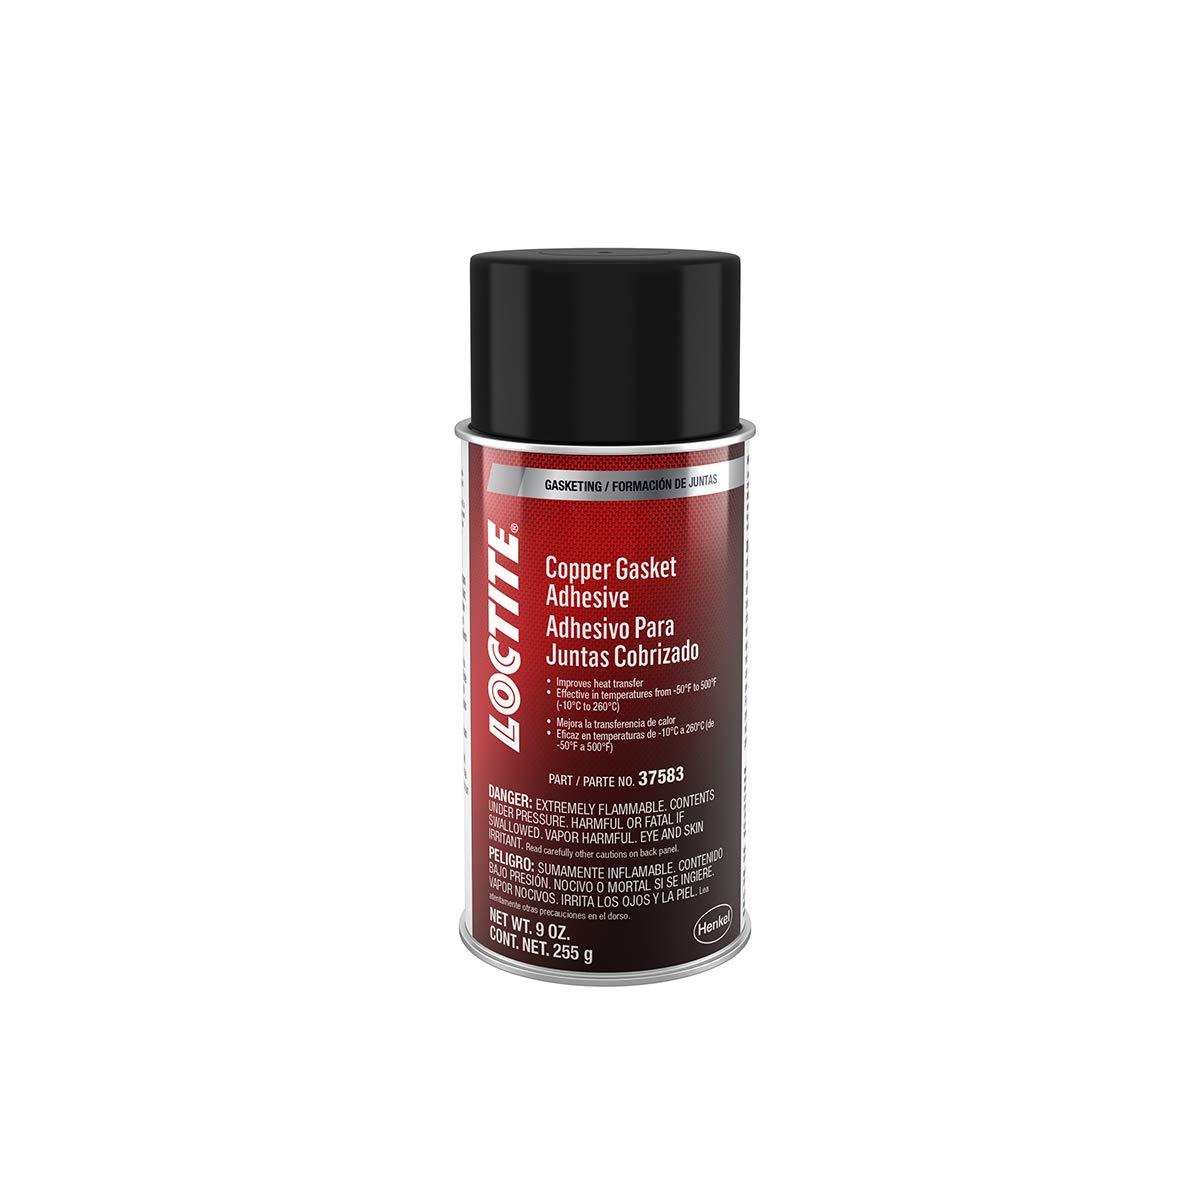 Loctite 502911 Copper Gasket High Temperature Adhesive Sealant Aerosol Can, 9-oz.